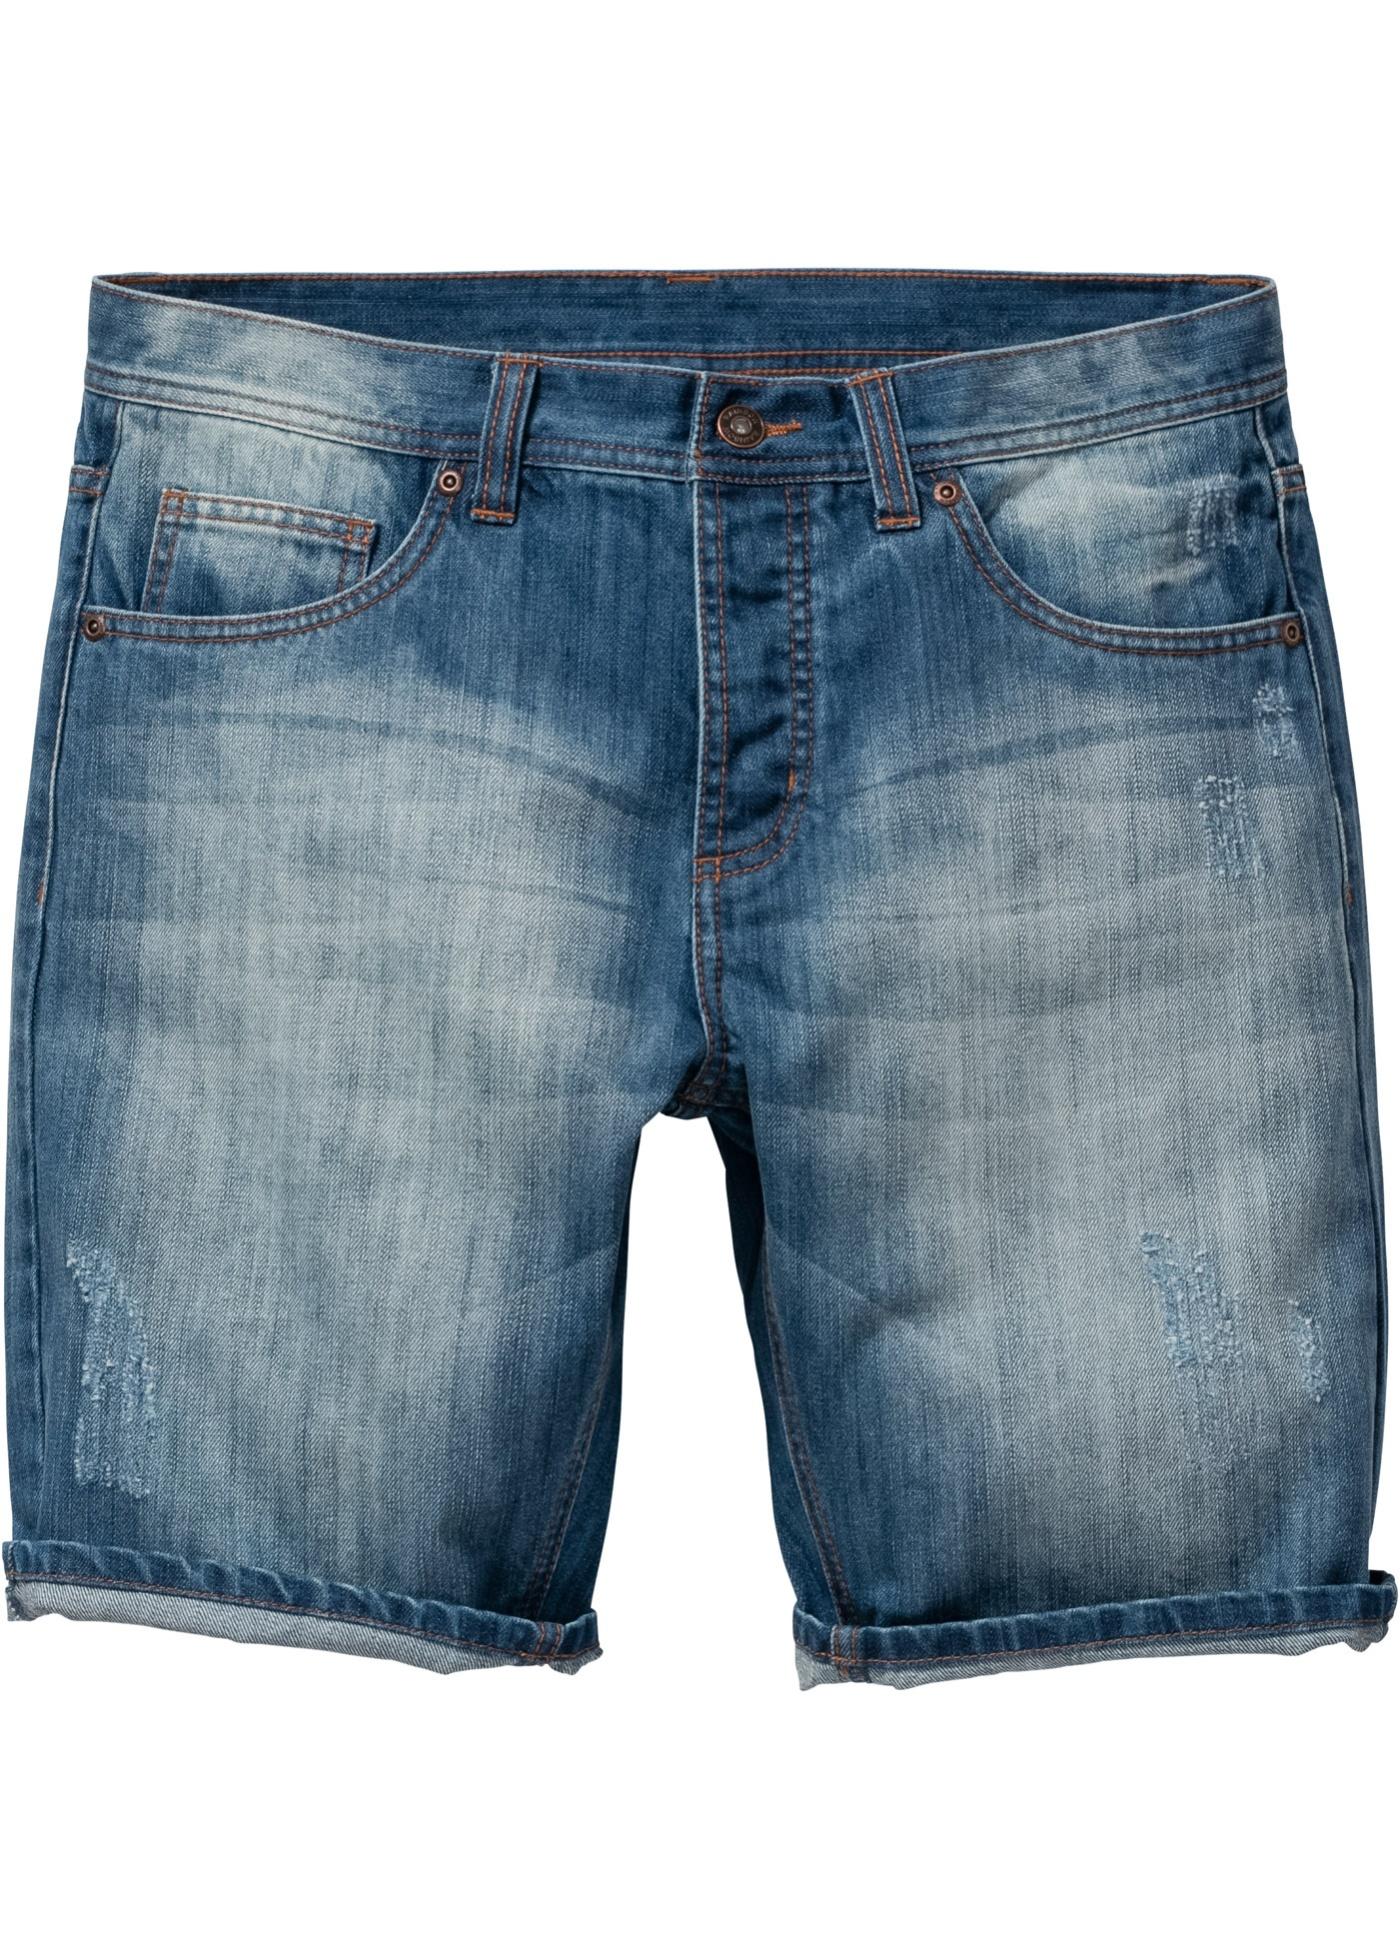 Bermuda in jeans loose fi